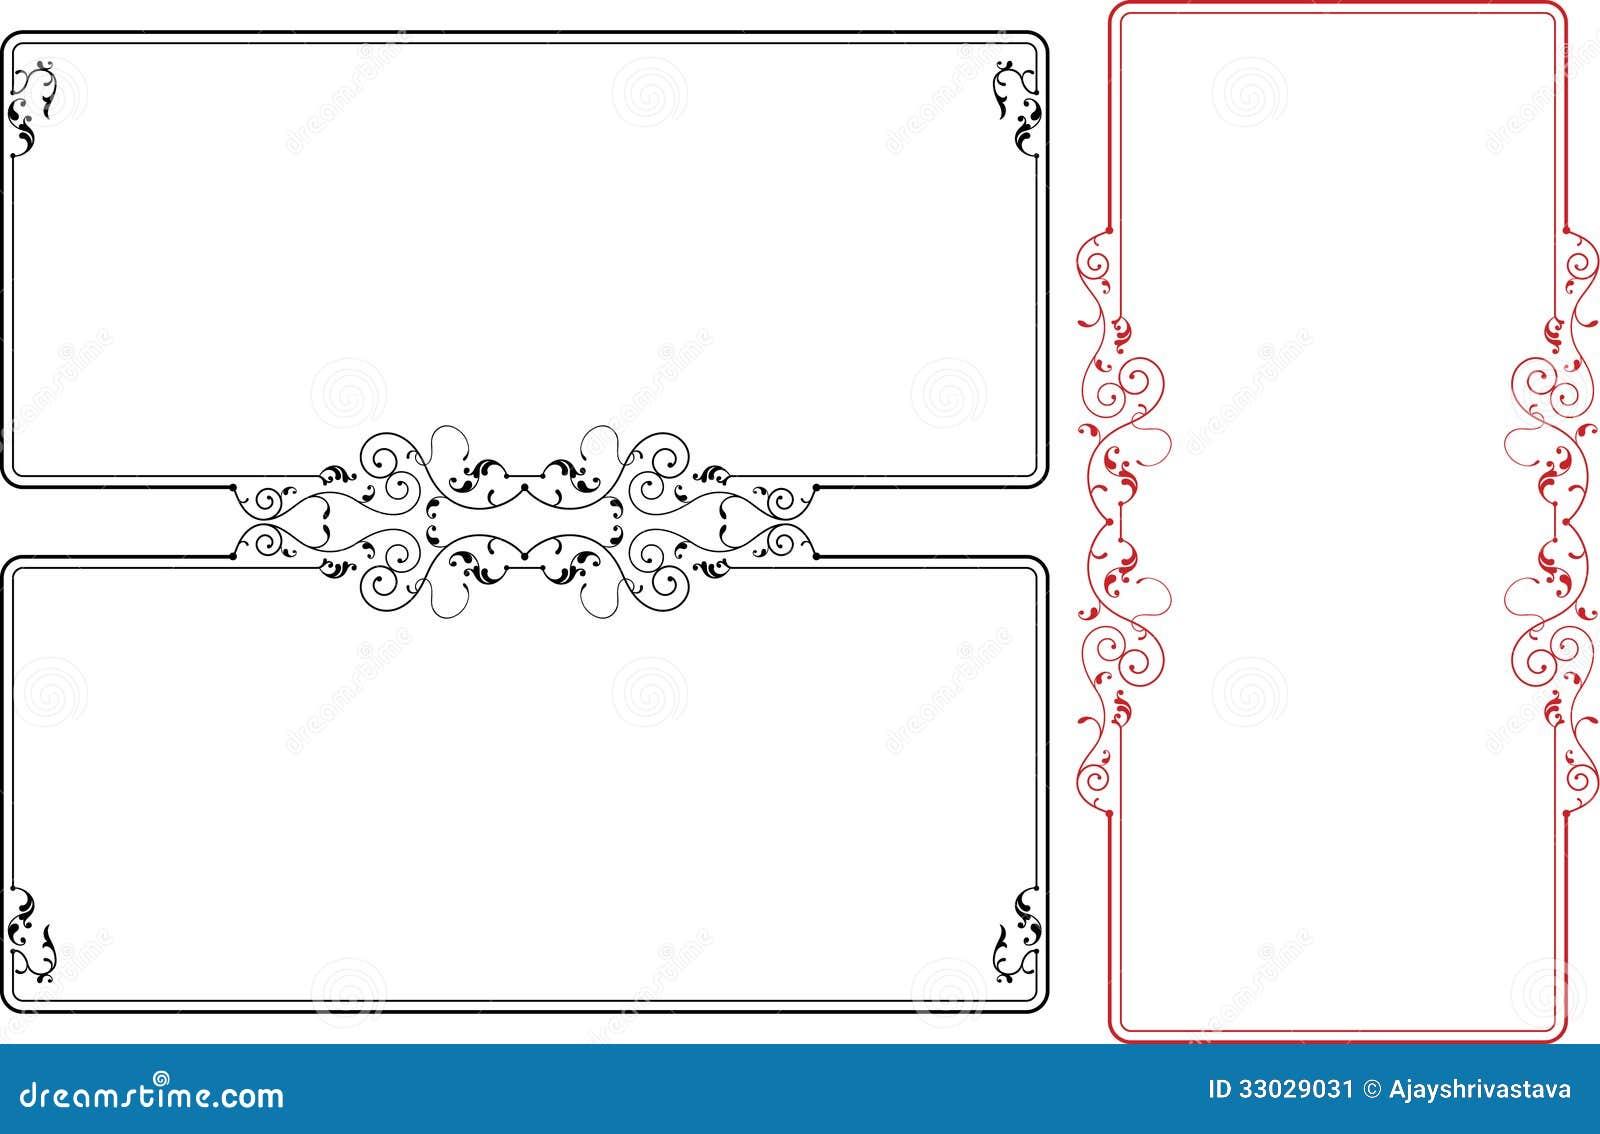 Free ornamental mandala vector download free vector art stock - Frame Border Design Stock Image Image 33029031